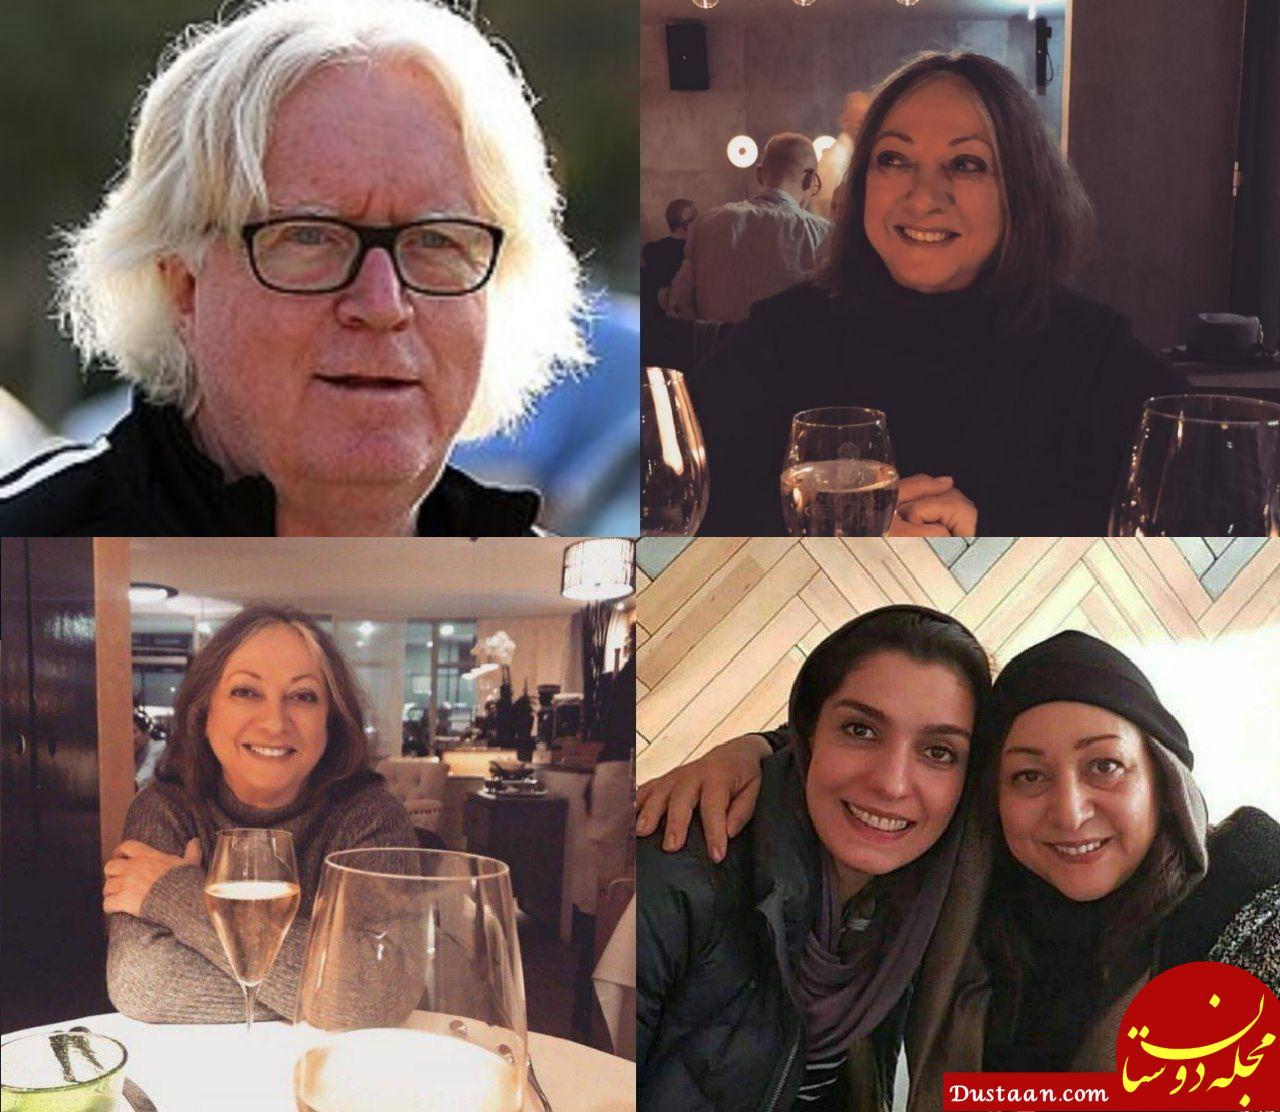 www.dustaan.com شباهت جالب همسر سرمربی استقلال به بازیگر ایرانی! +عکس